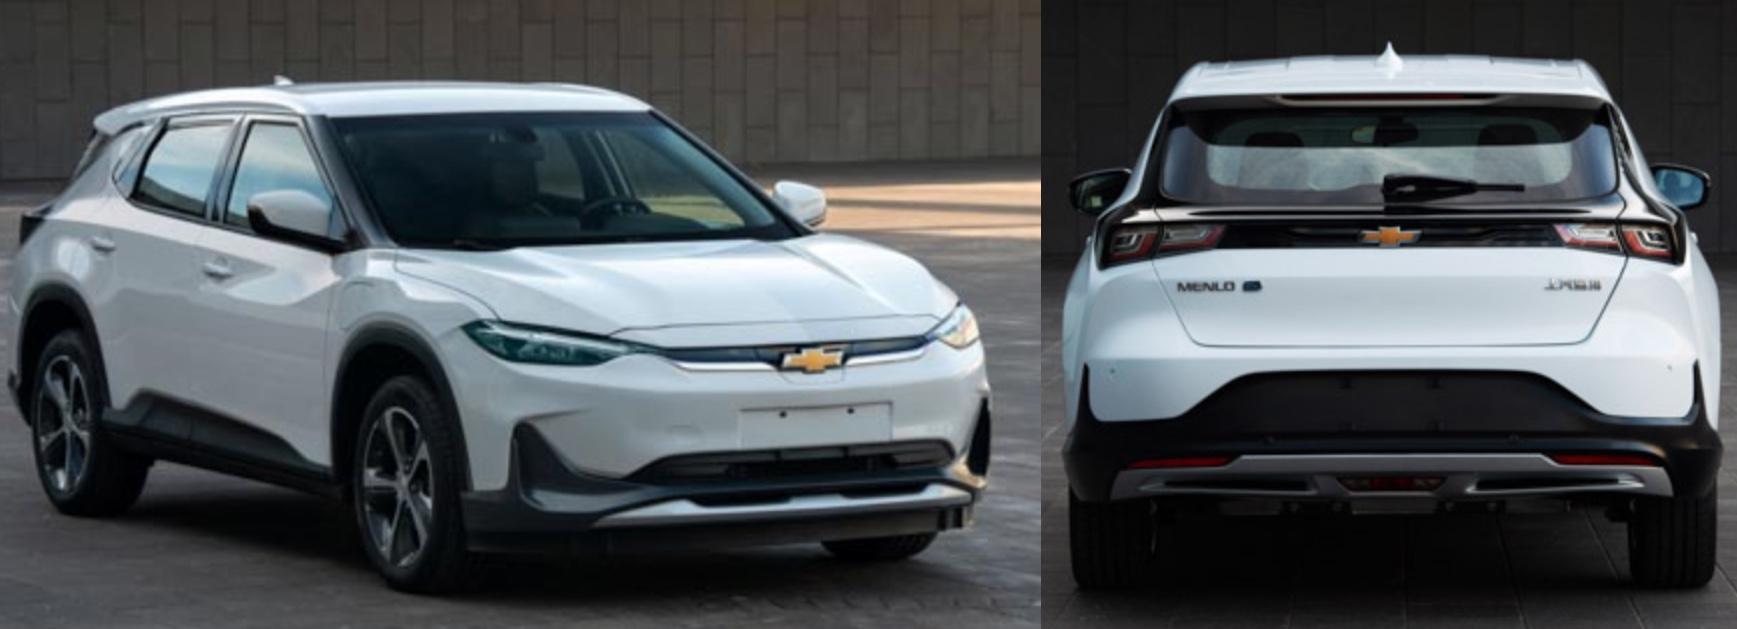 Gm Unveils Chevrolet Menlo Ev Electric Car A Bolt Ev Utility Vehicle Electrek